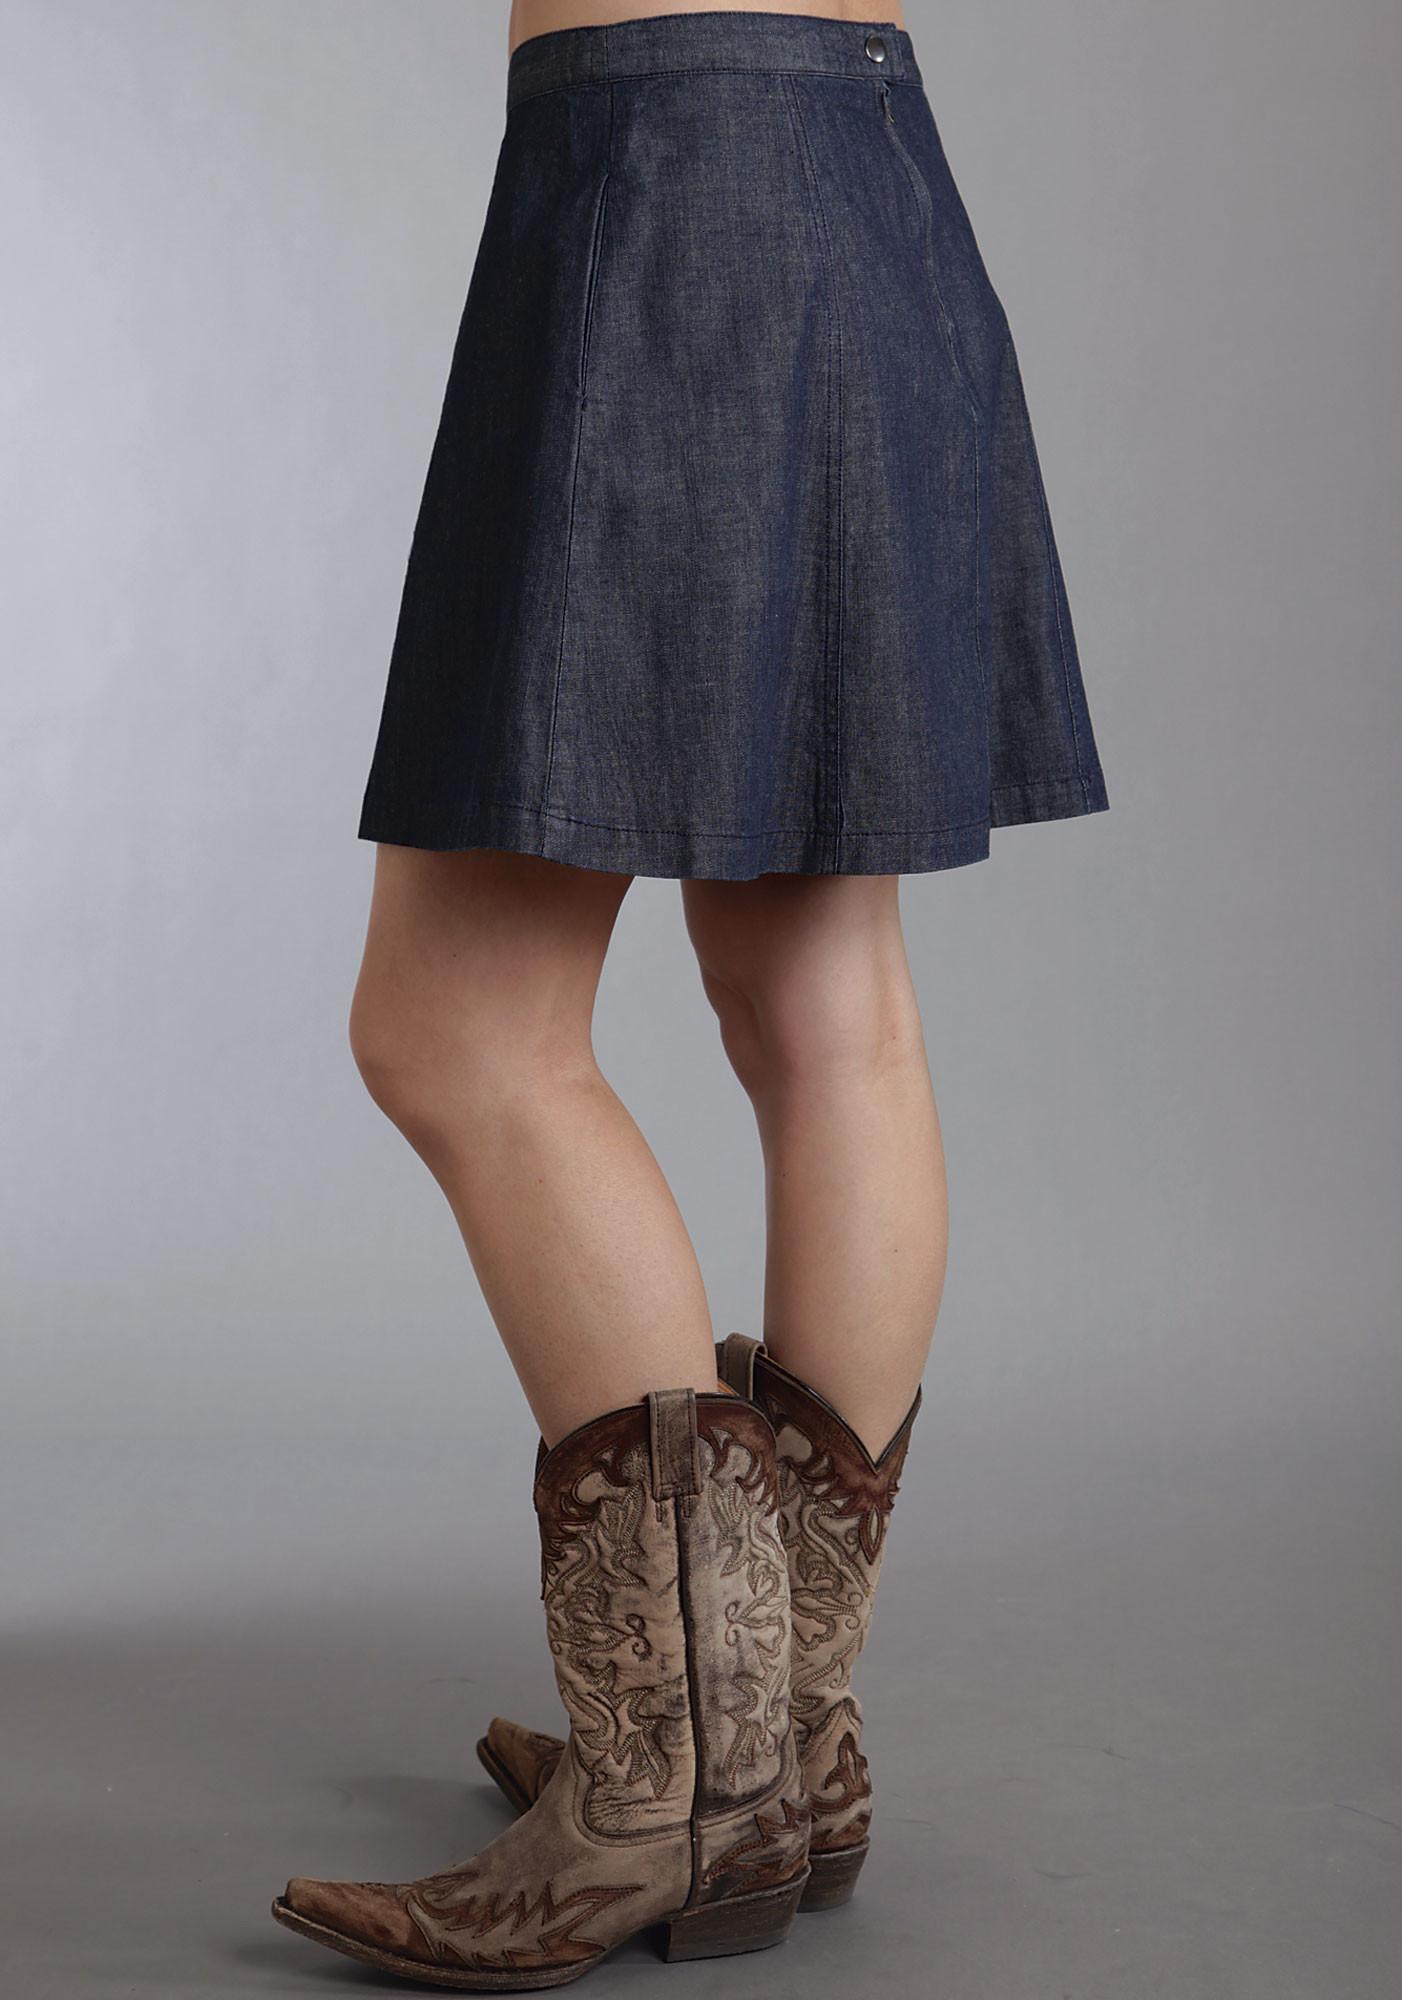 stetson 174 denim flared western skirt